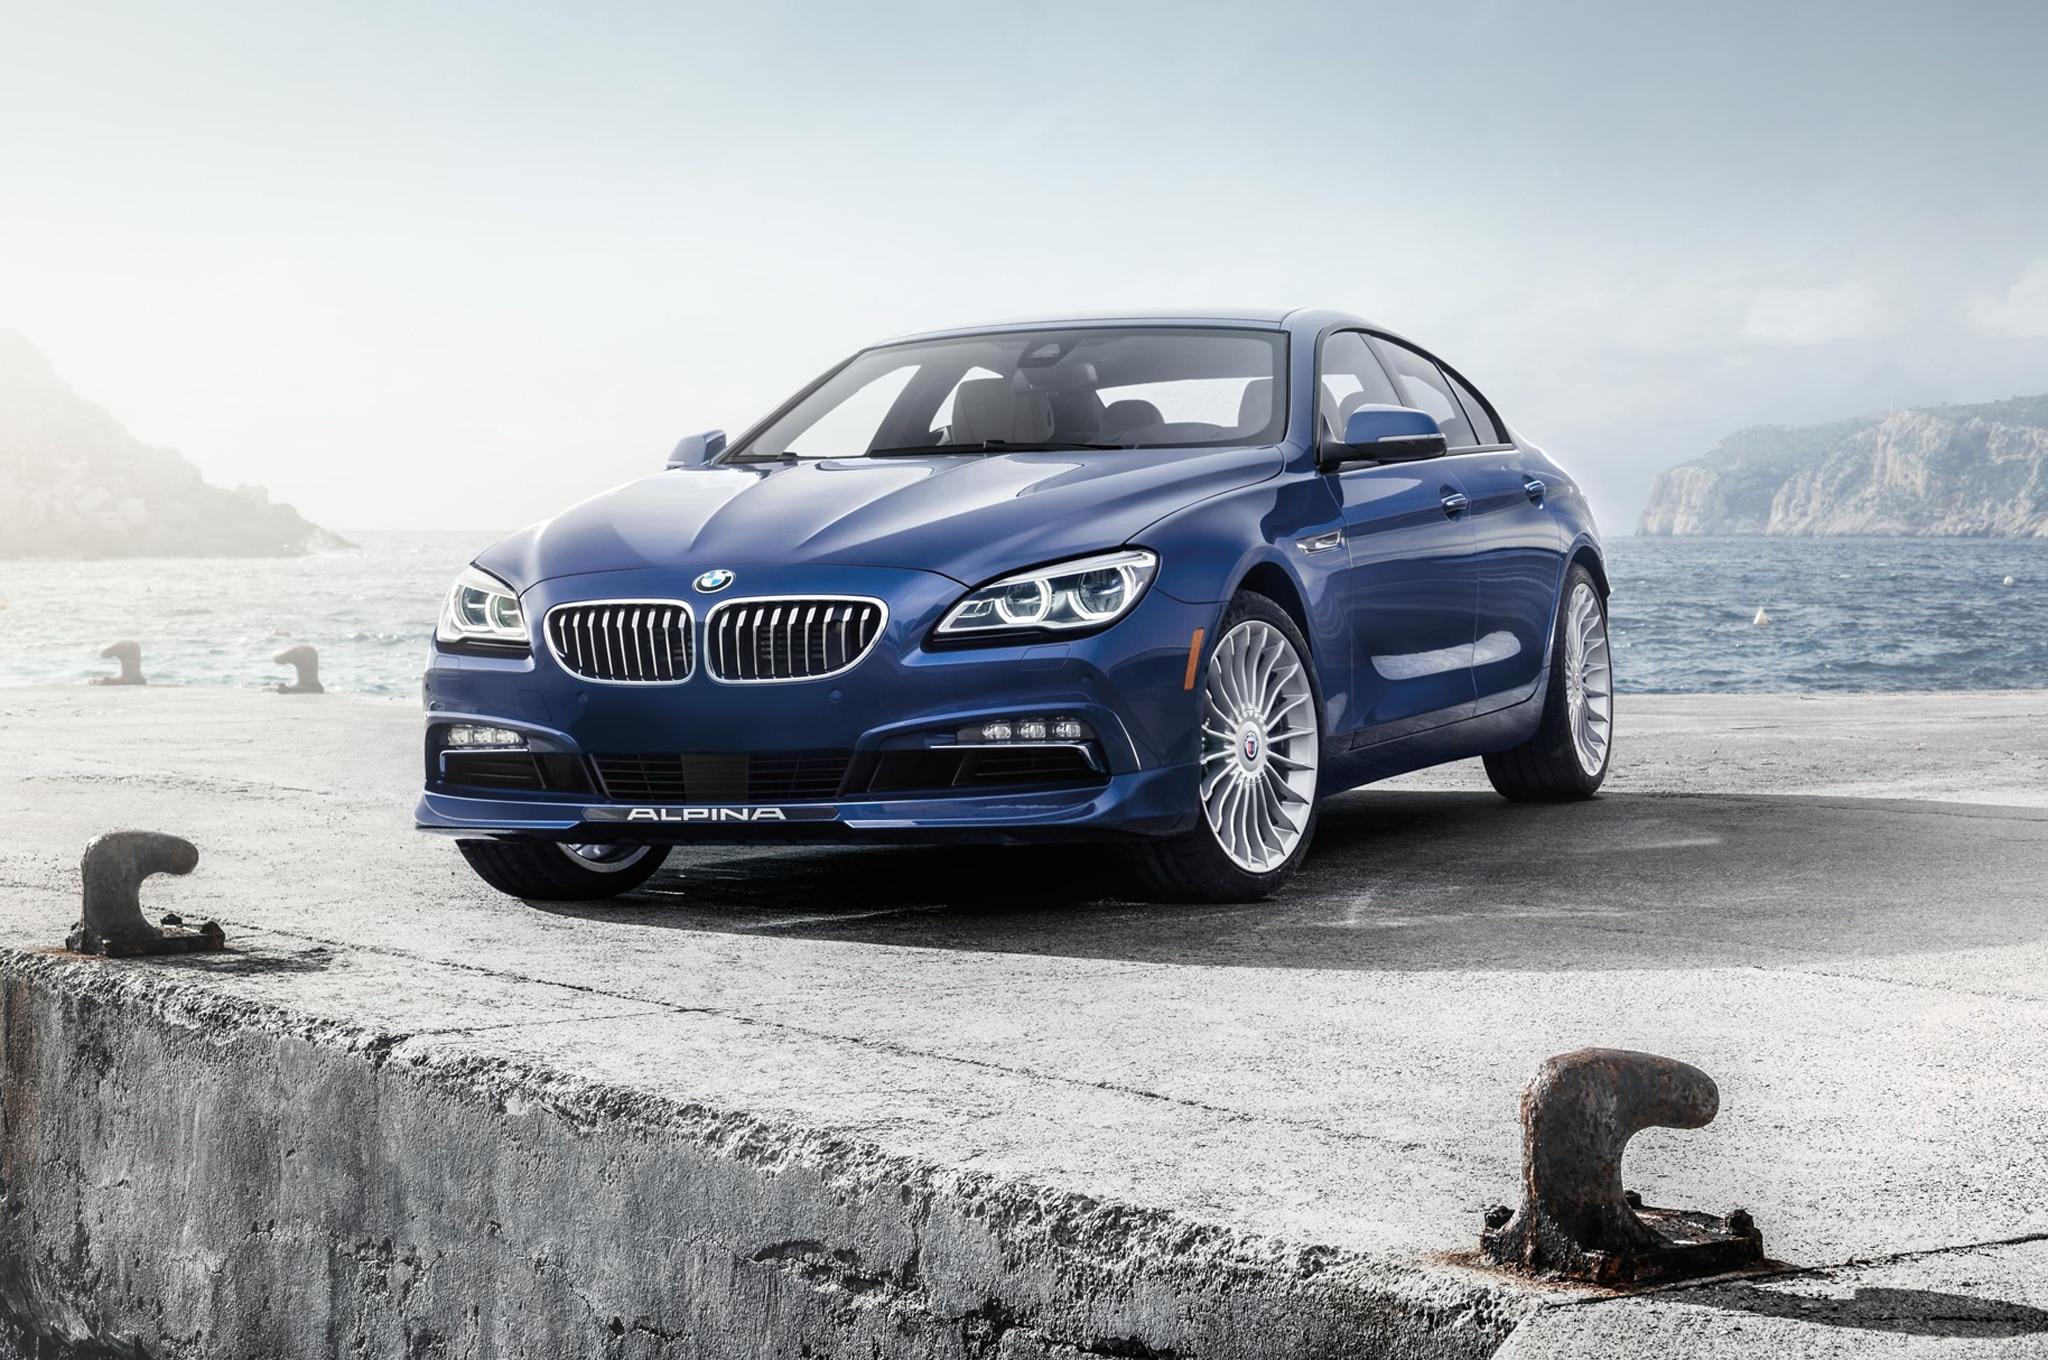 2016 BMW Alpina B6 XDrive Gran Coupe Bumps Power To 600 HP 6 Advertisement Skip 1